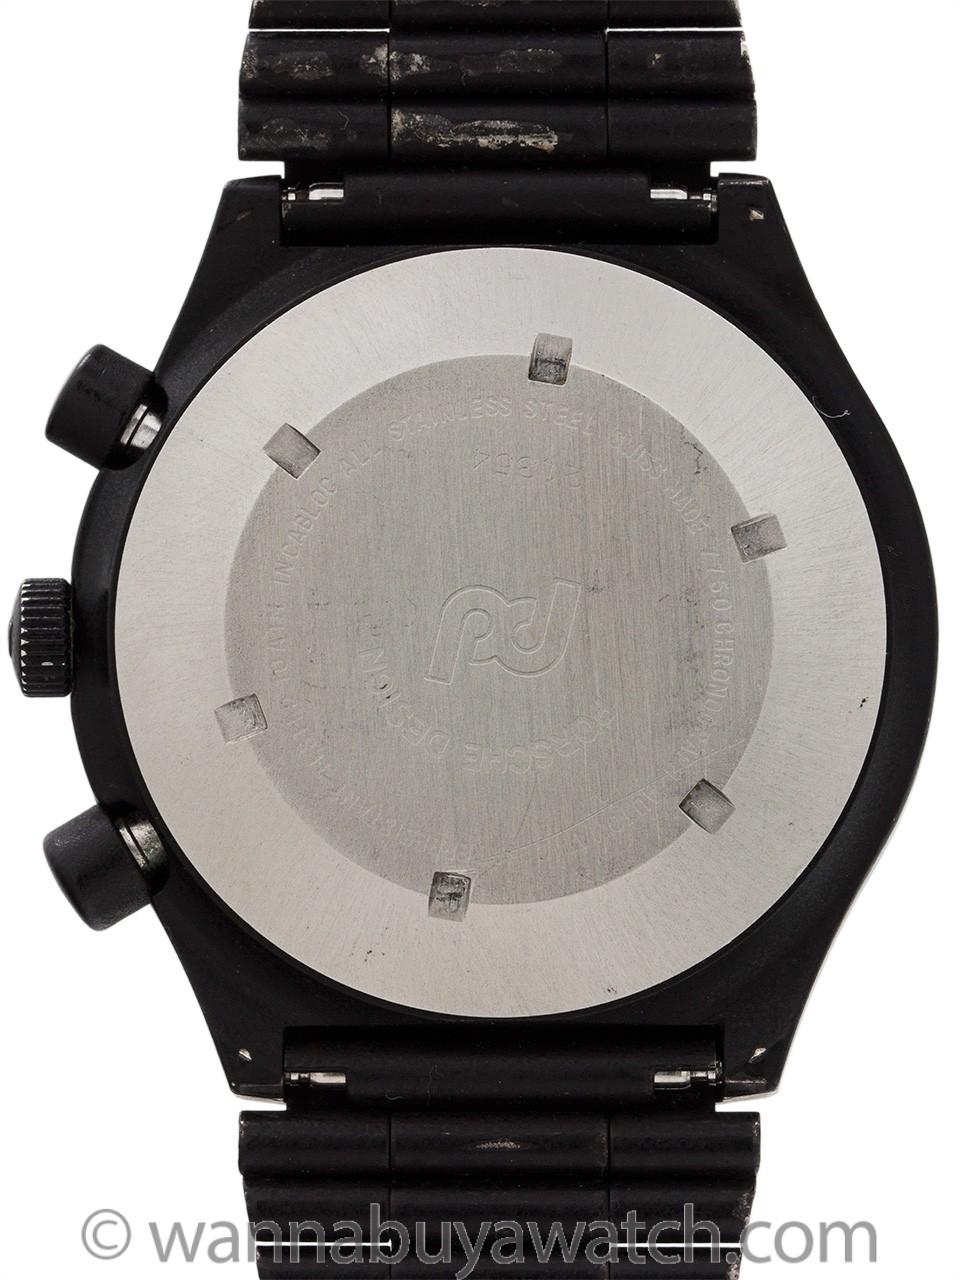 Design By Circa Automatic Chronograph 1970's Porsche Orfina eWEDH2Ib9Y